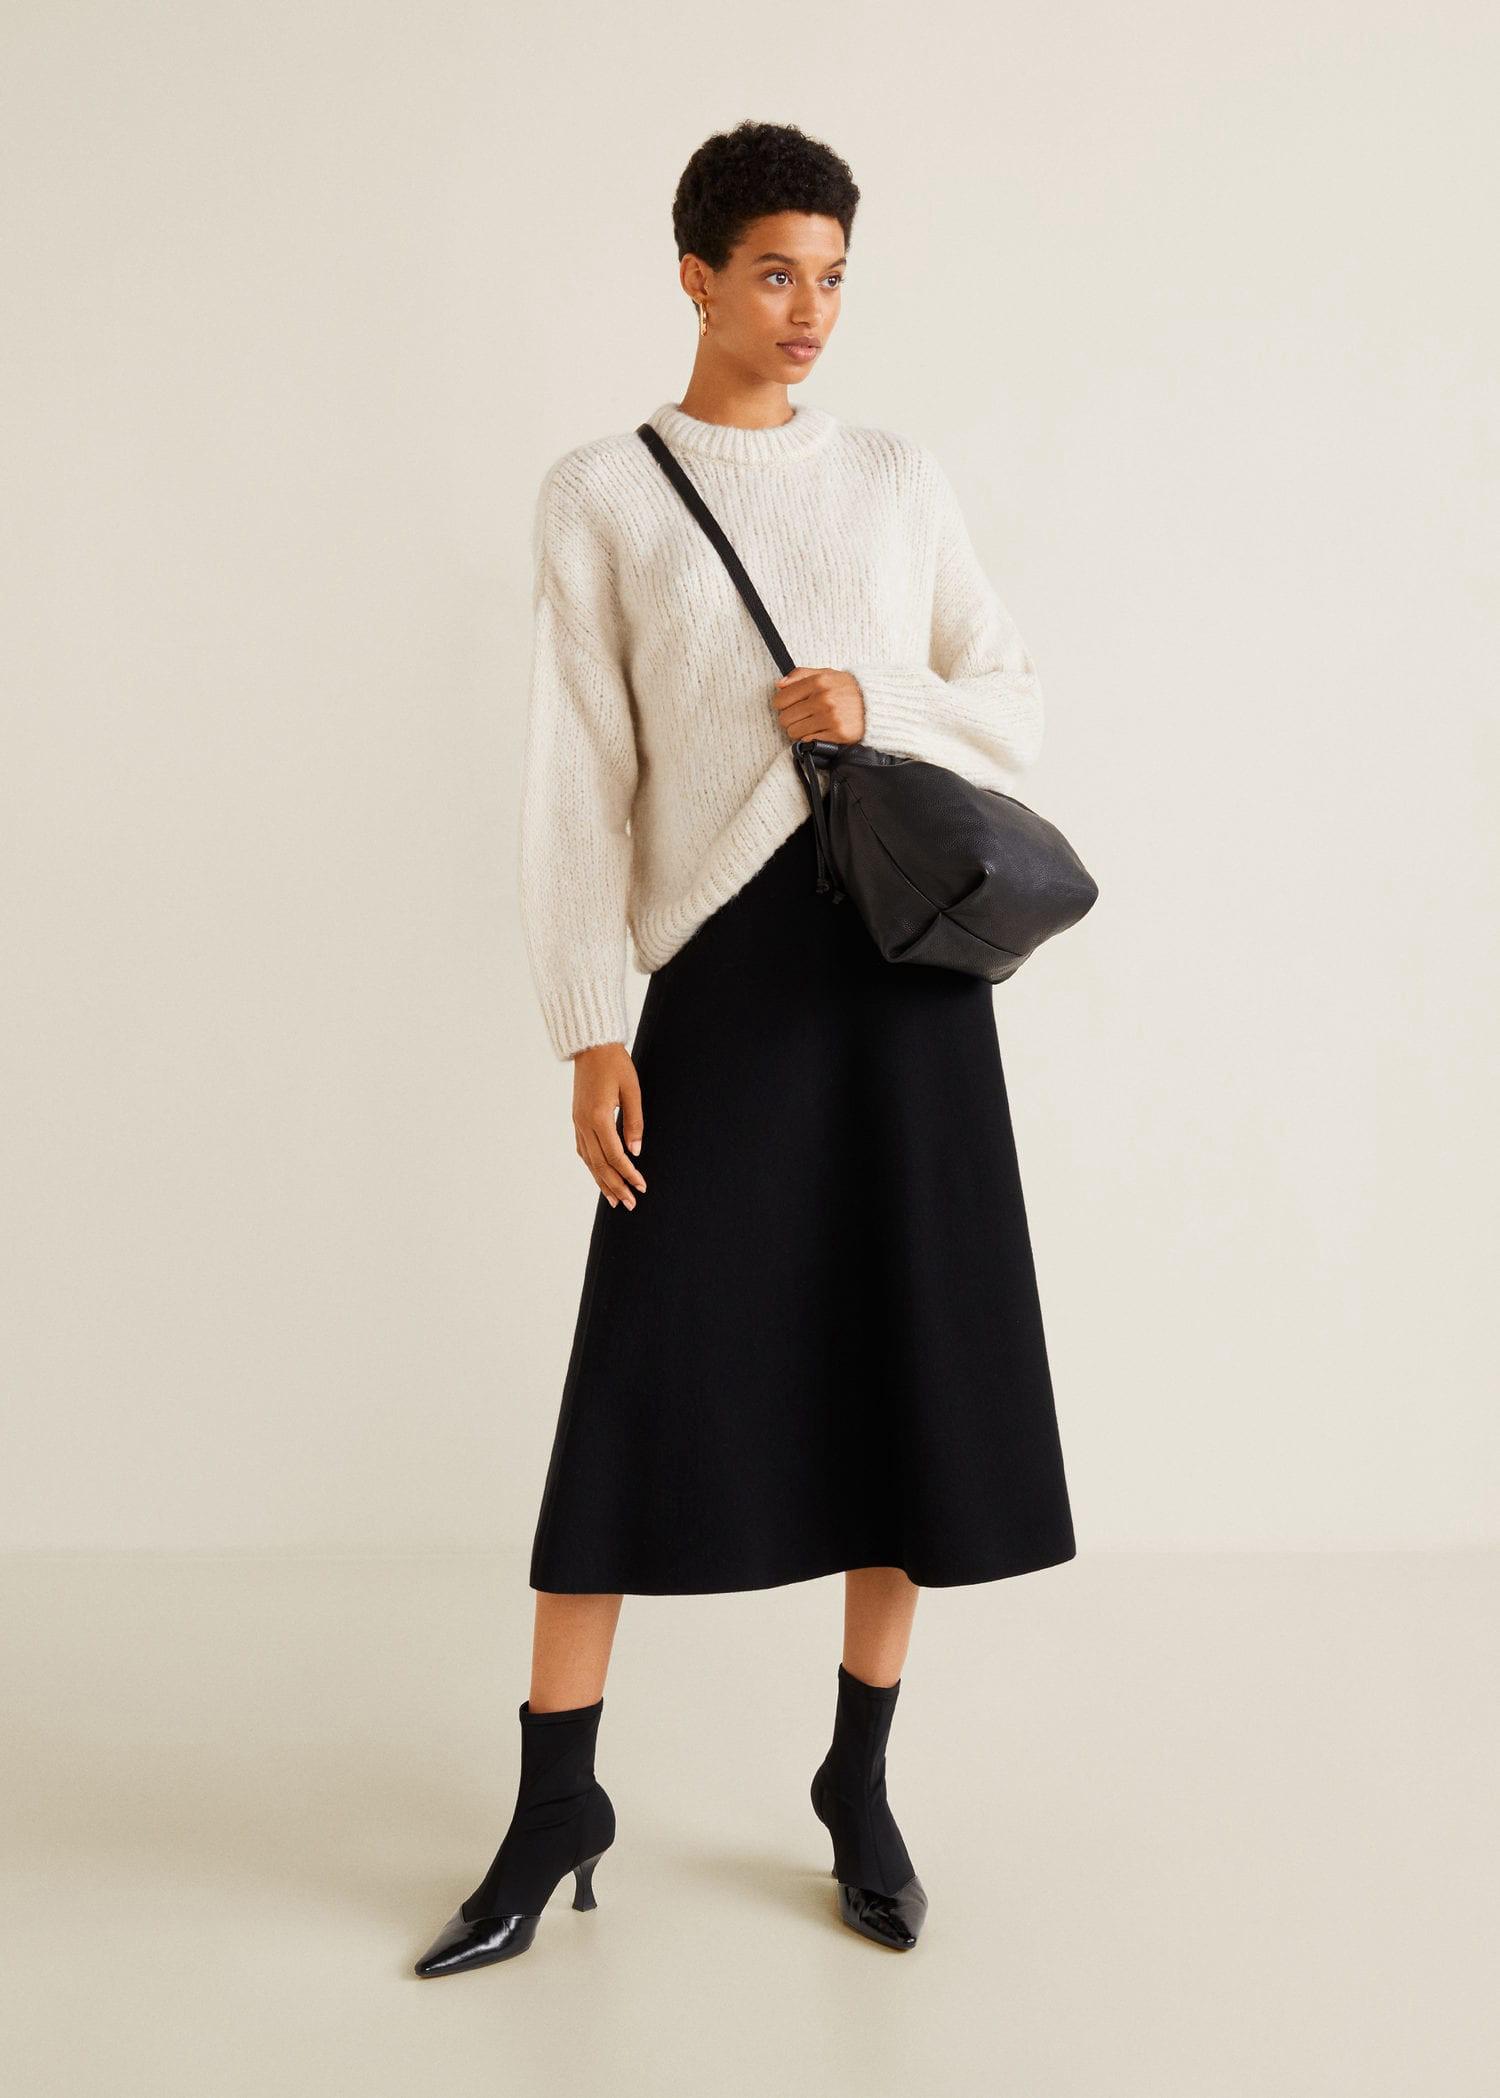 18bdfa0236 Mango Flared Long Skirt - XS | Products | Long skirts for women ...